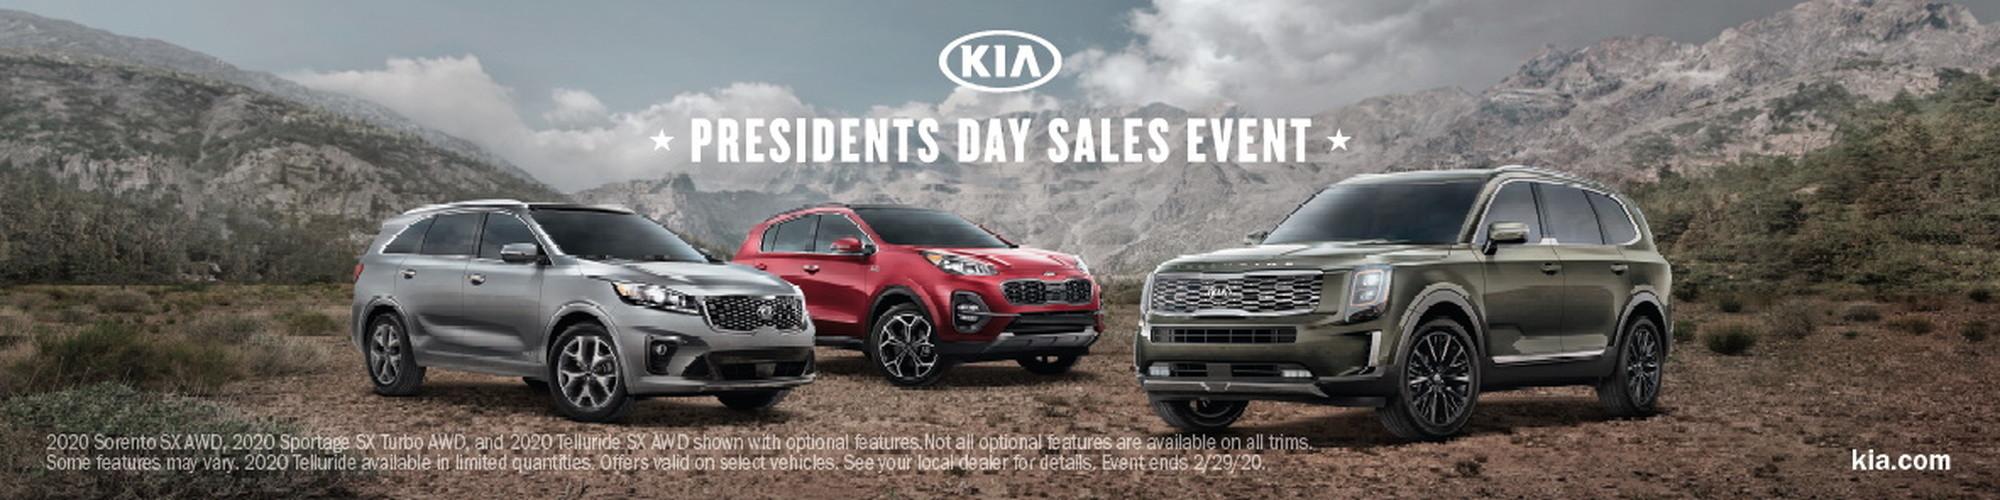 2020 Kia Presidents Day Sales Event